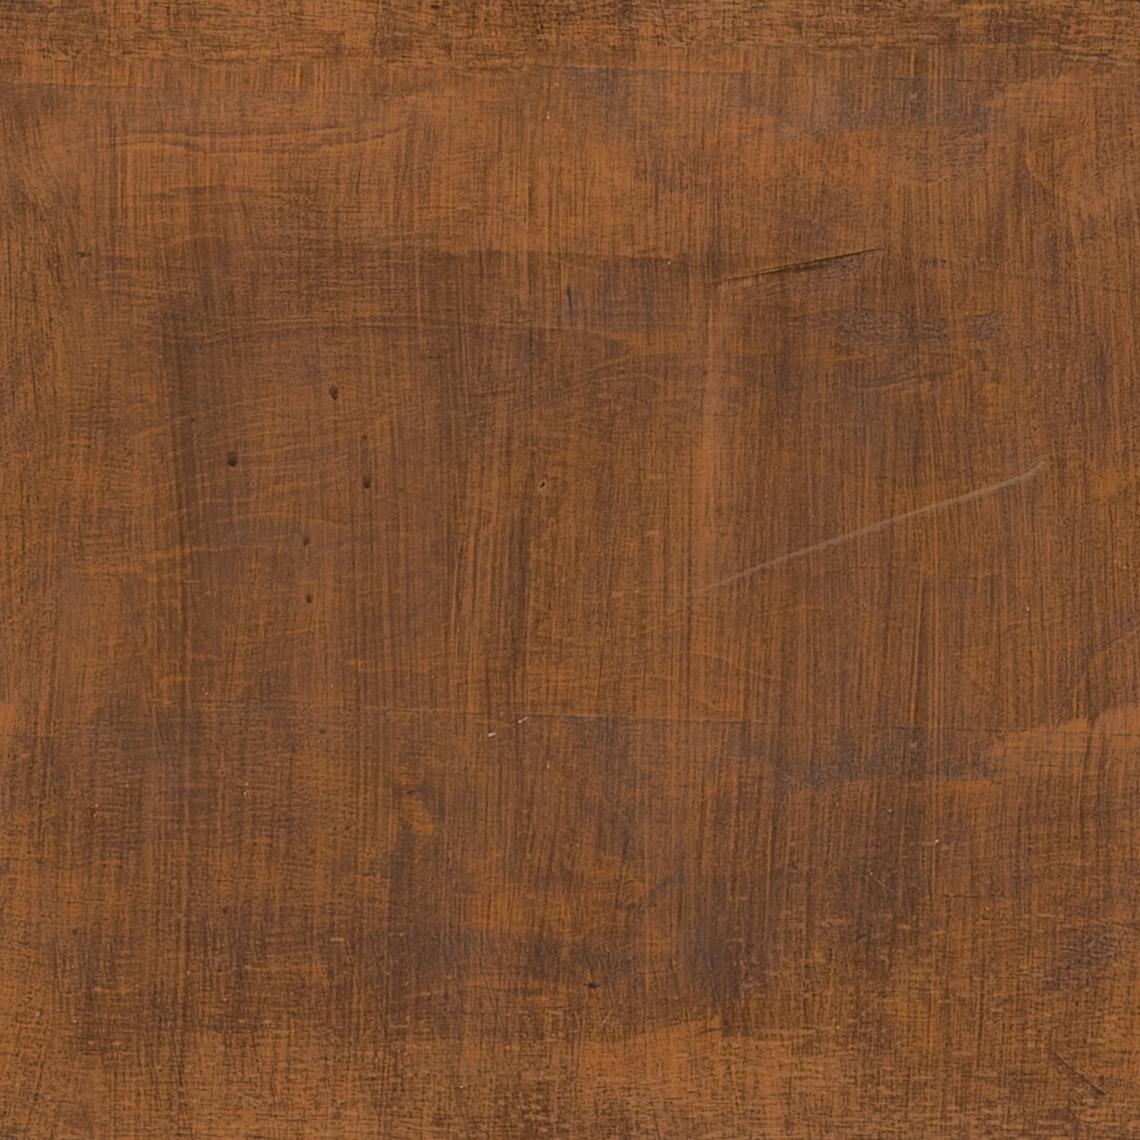 Wood-Plain-04-Albedo